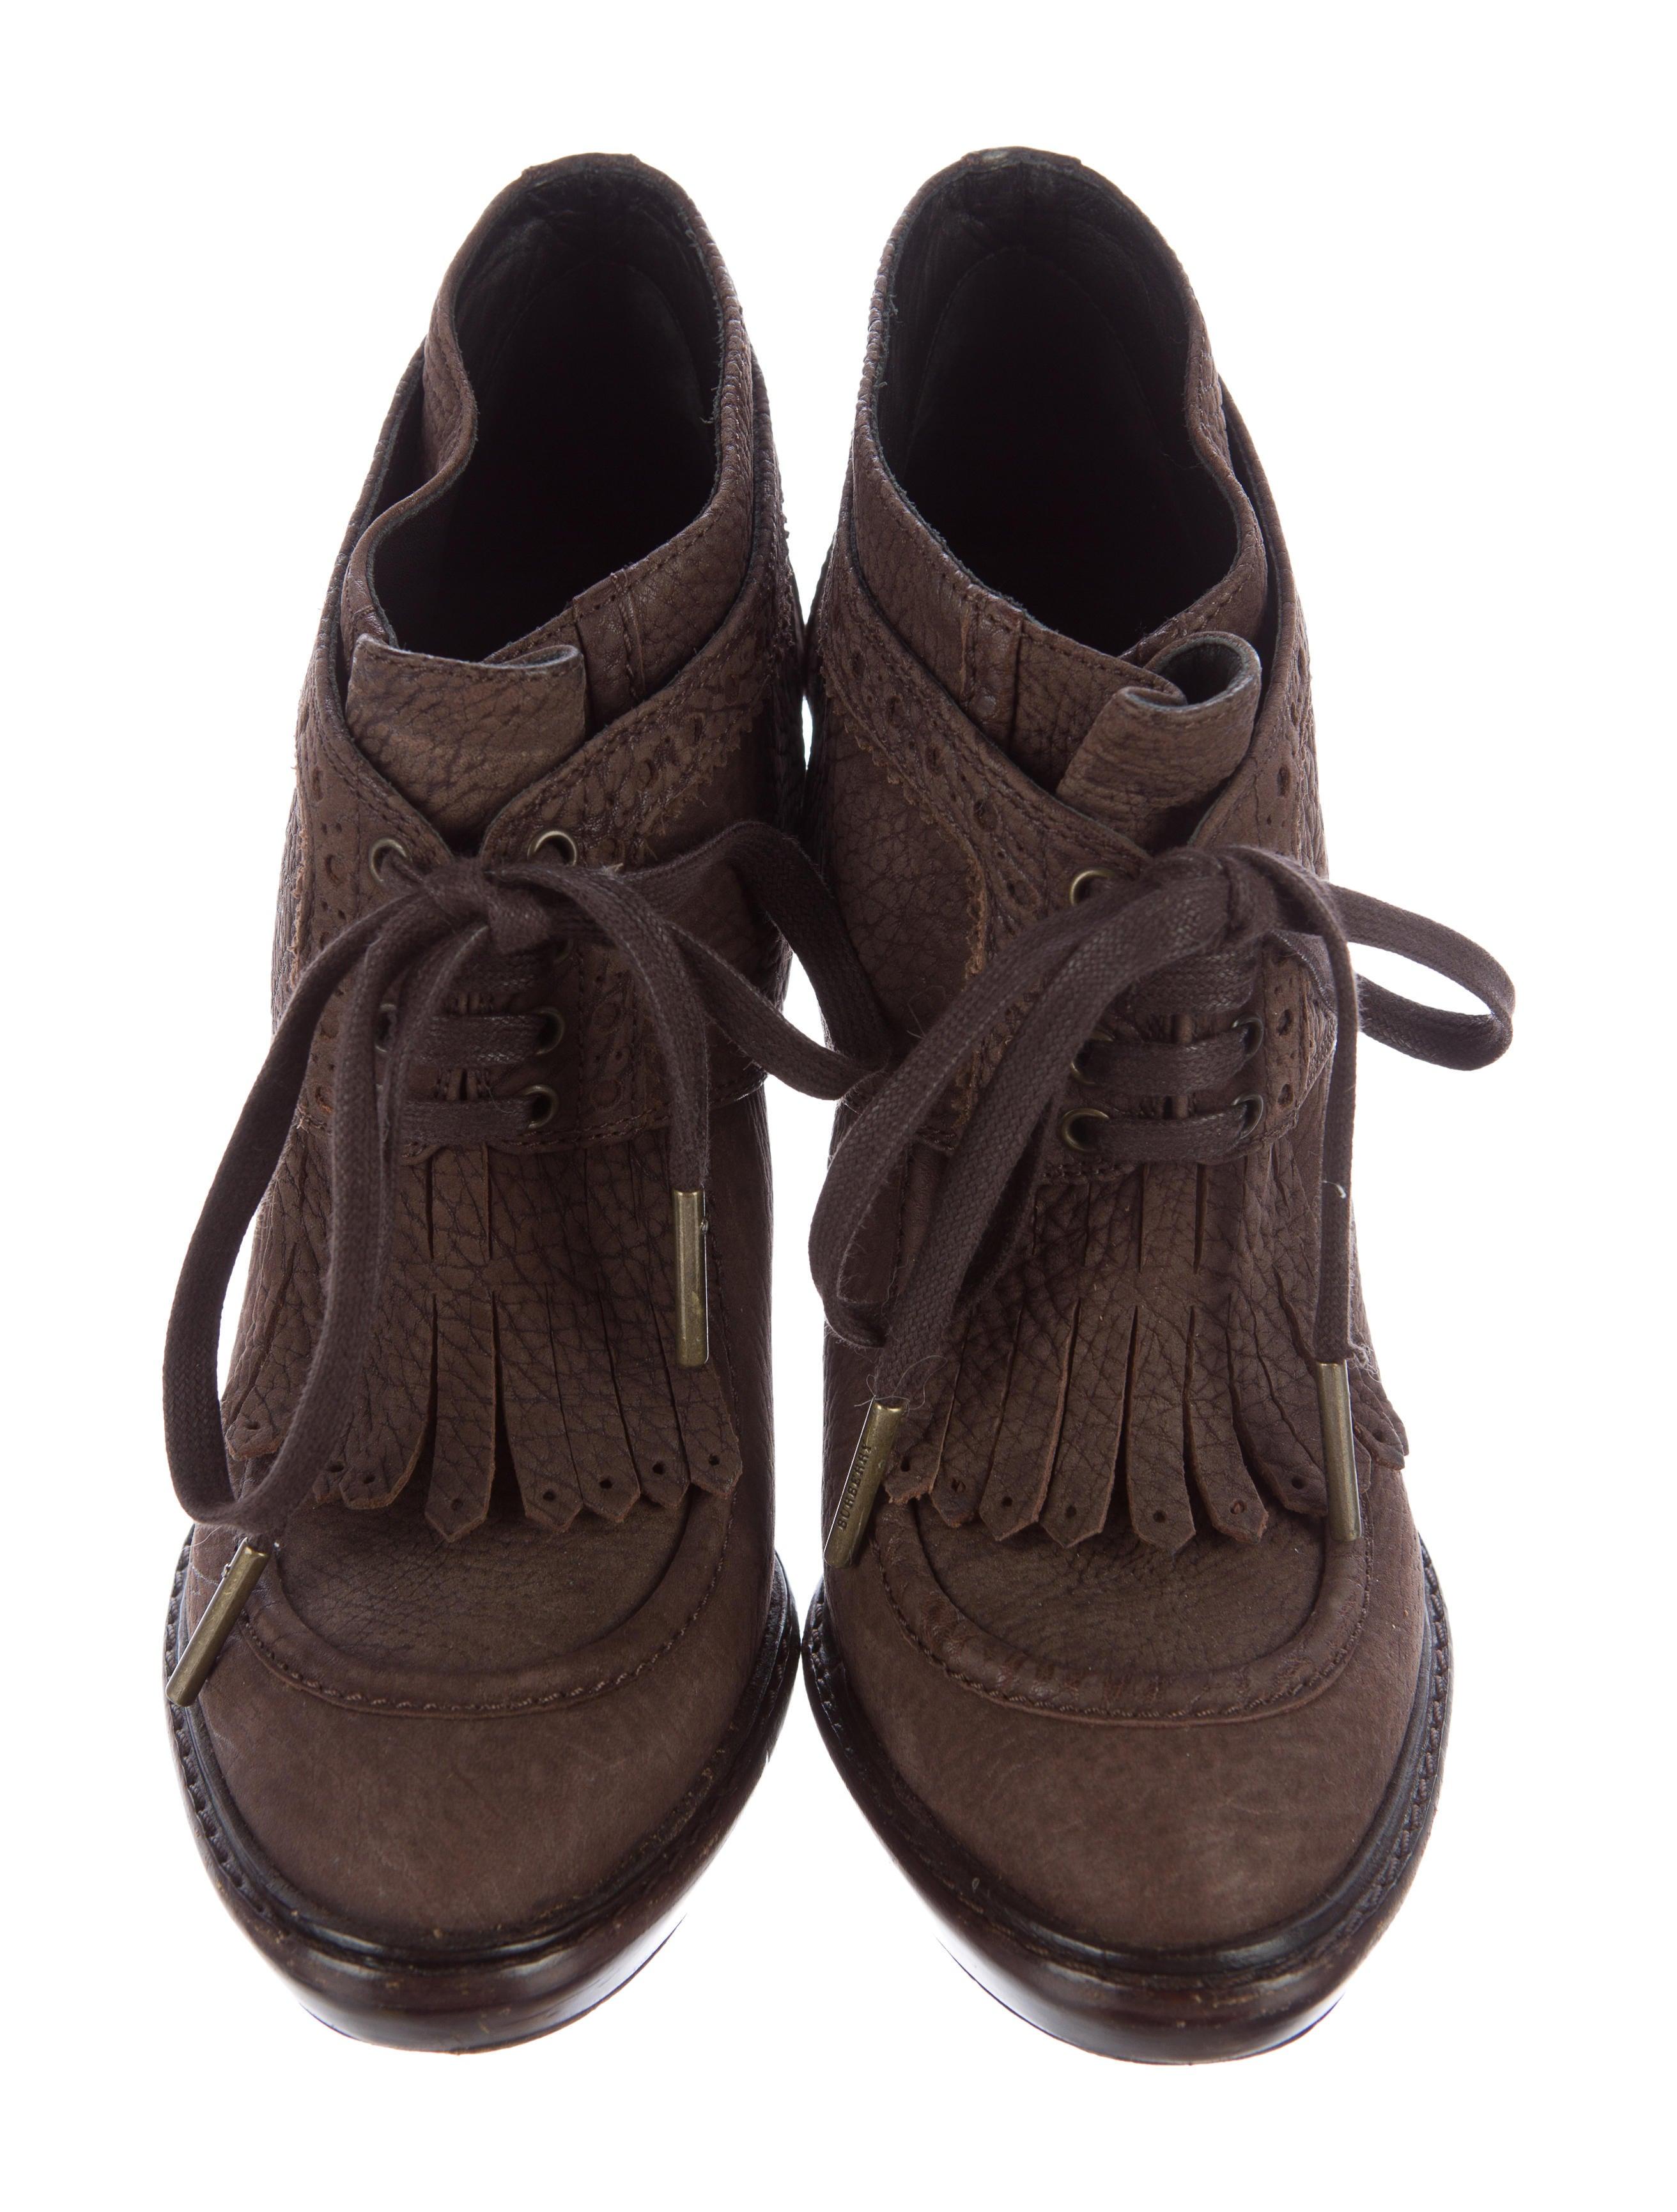 Burberry Prorsum Fringe Platform Boot Shoes Buf23388